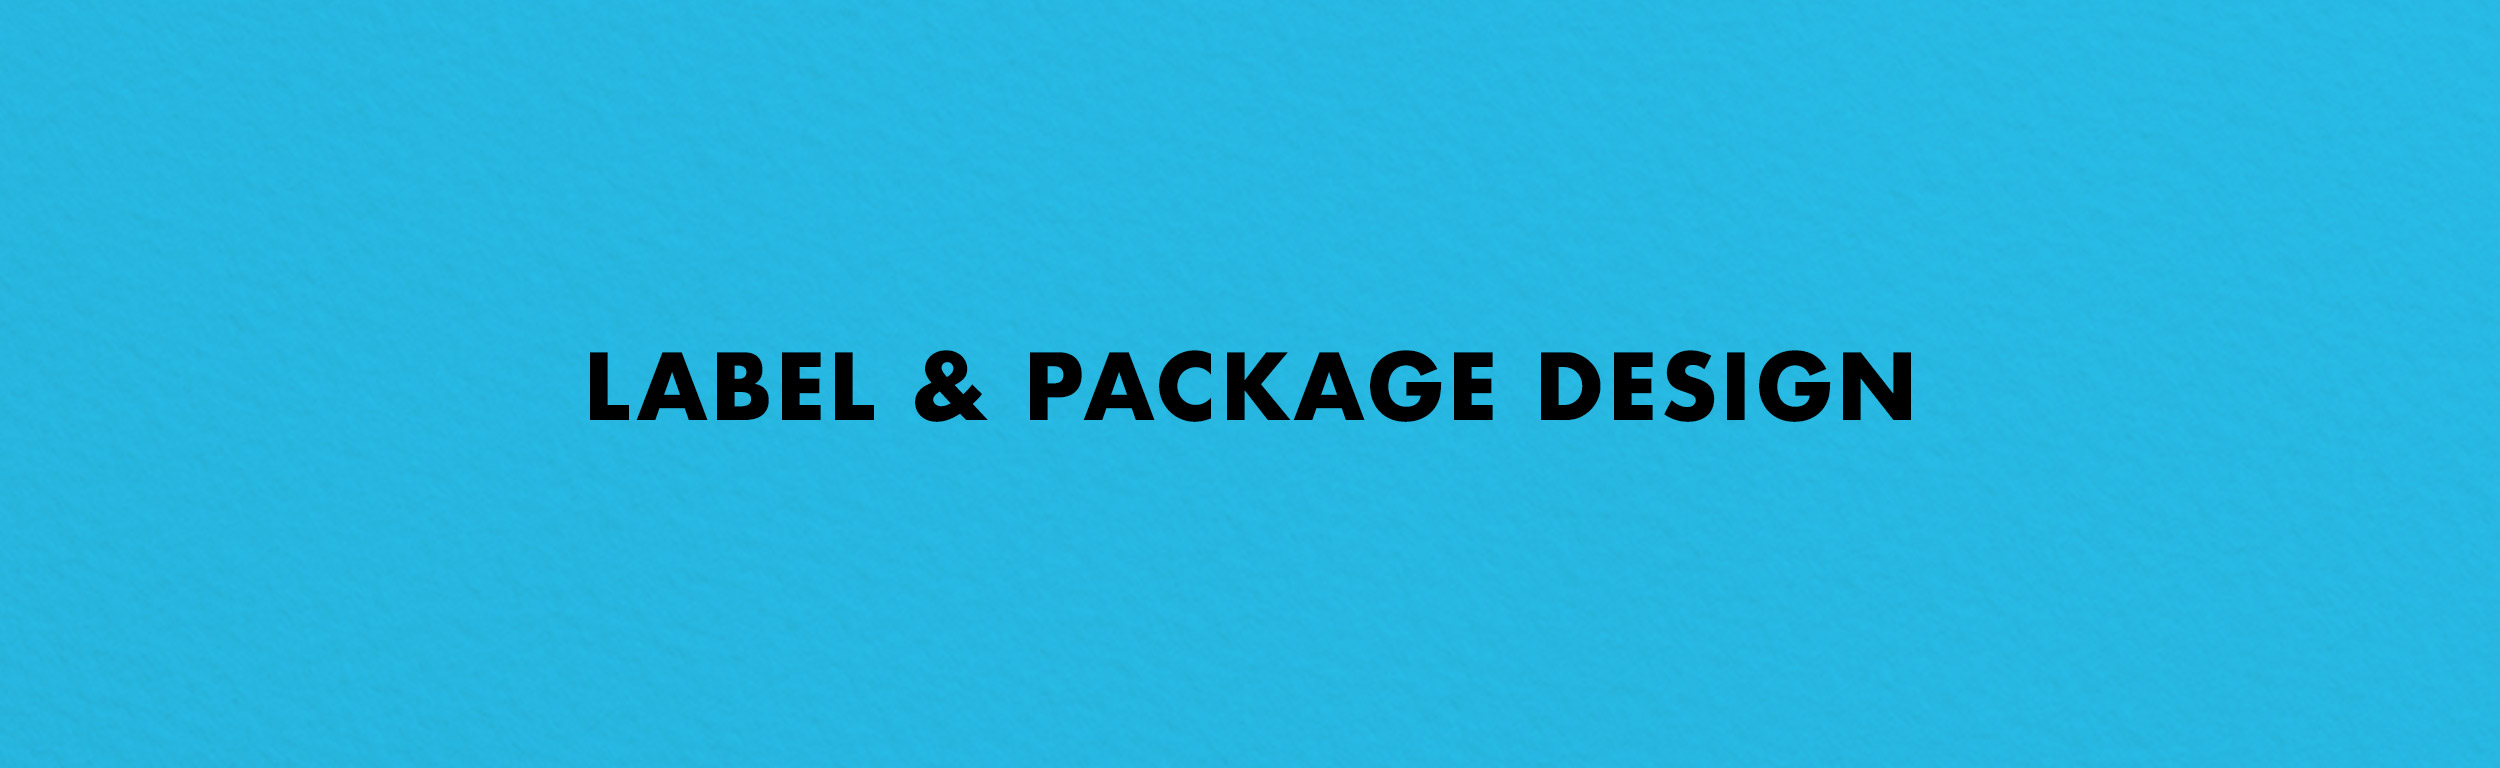 label-_package_design.jpg